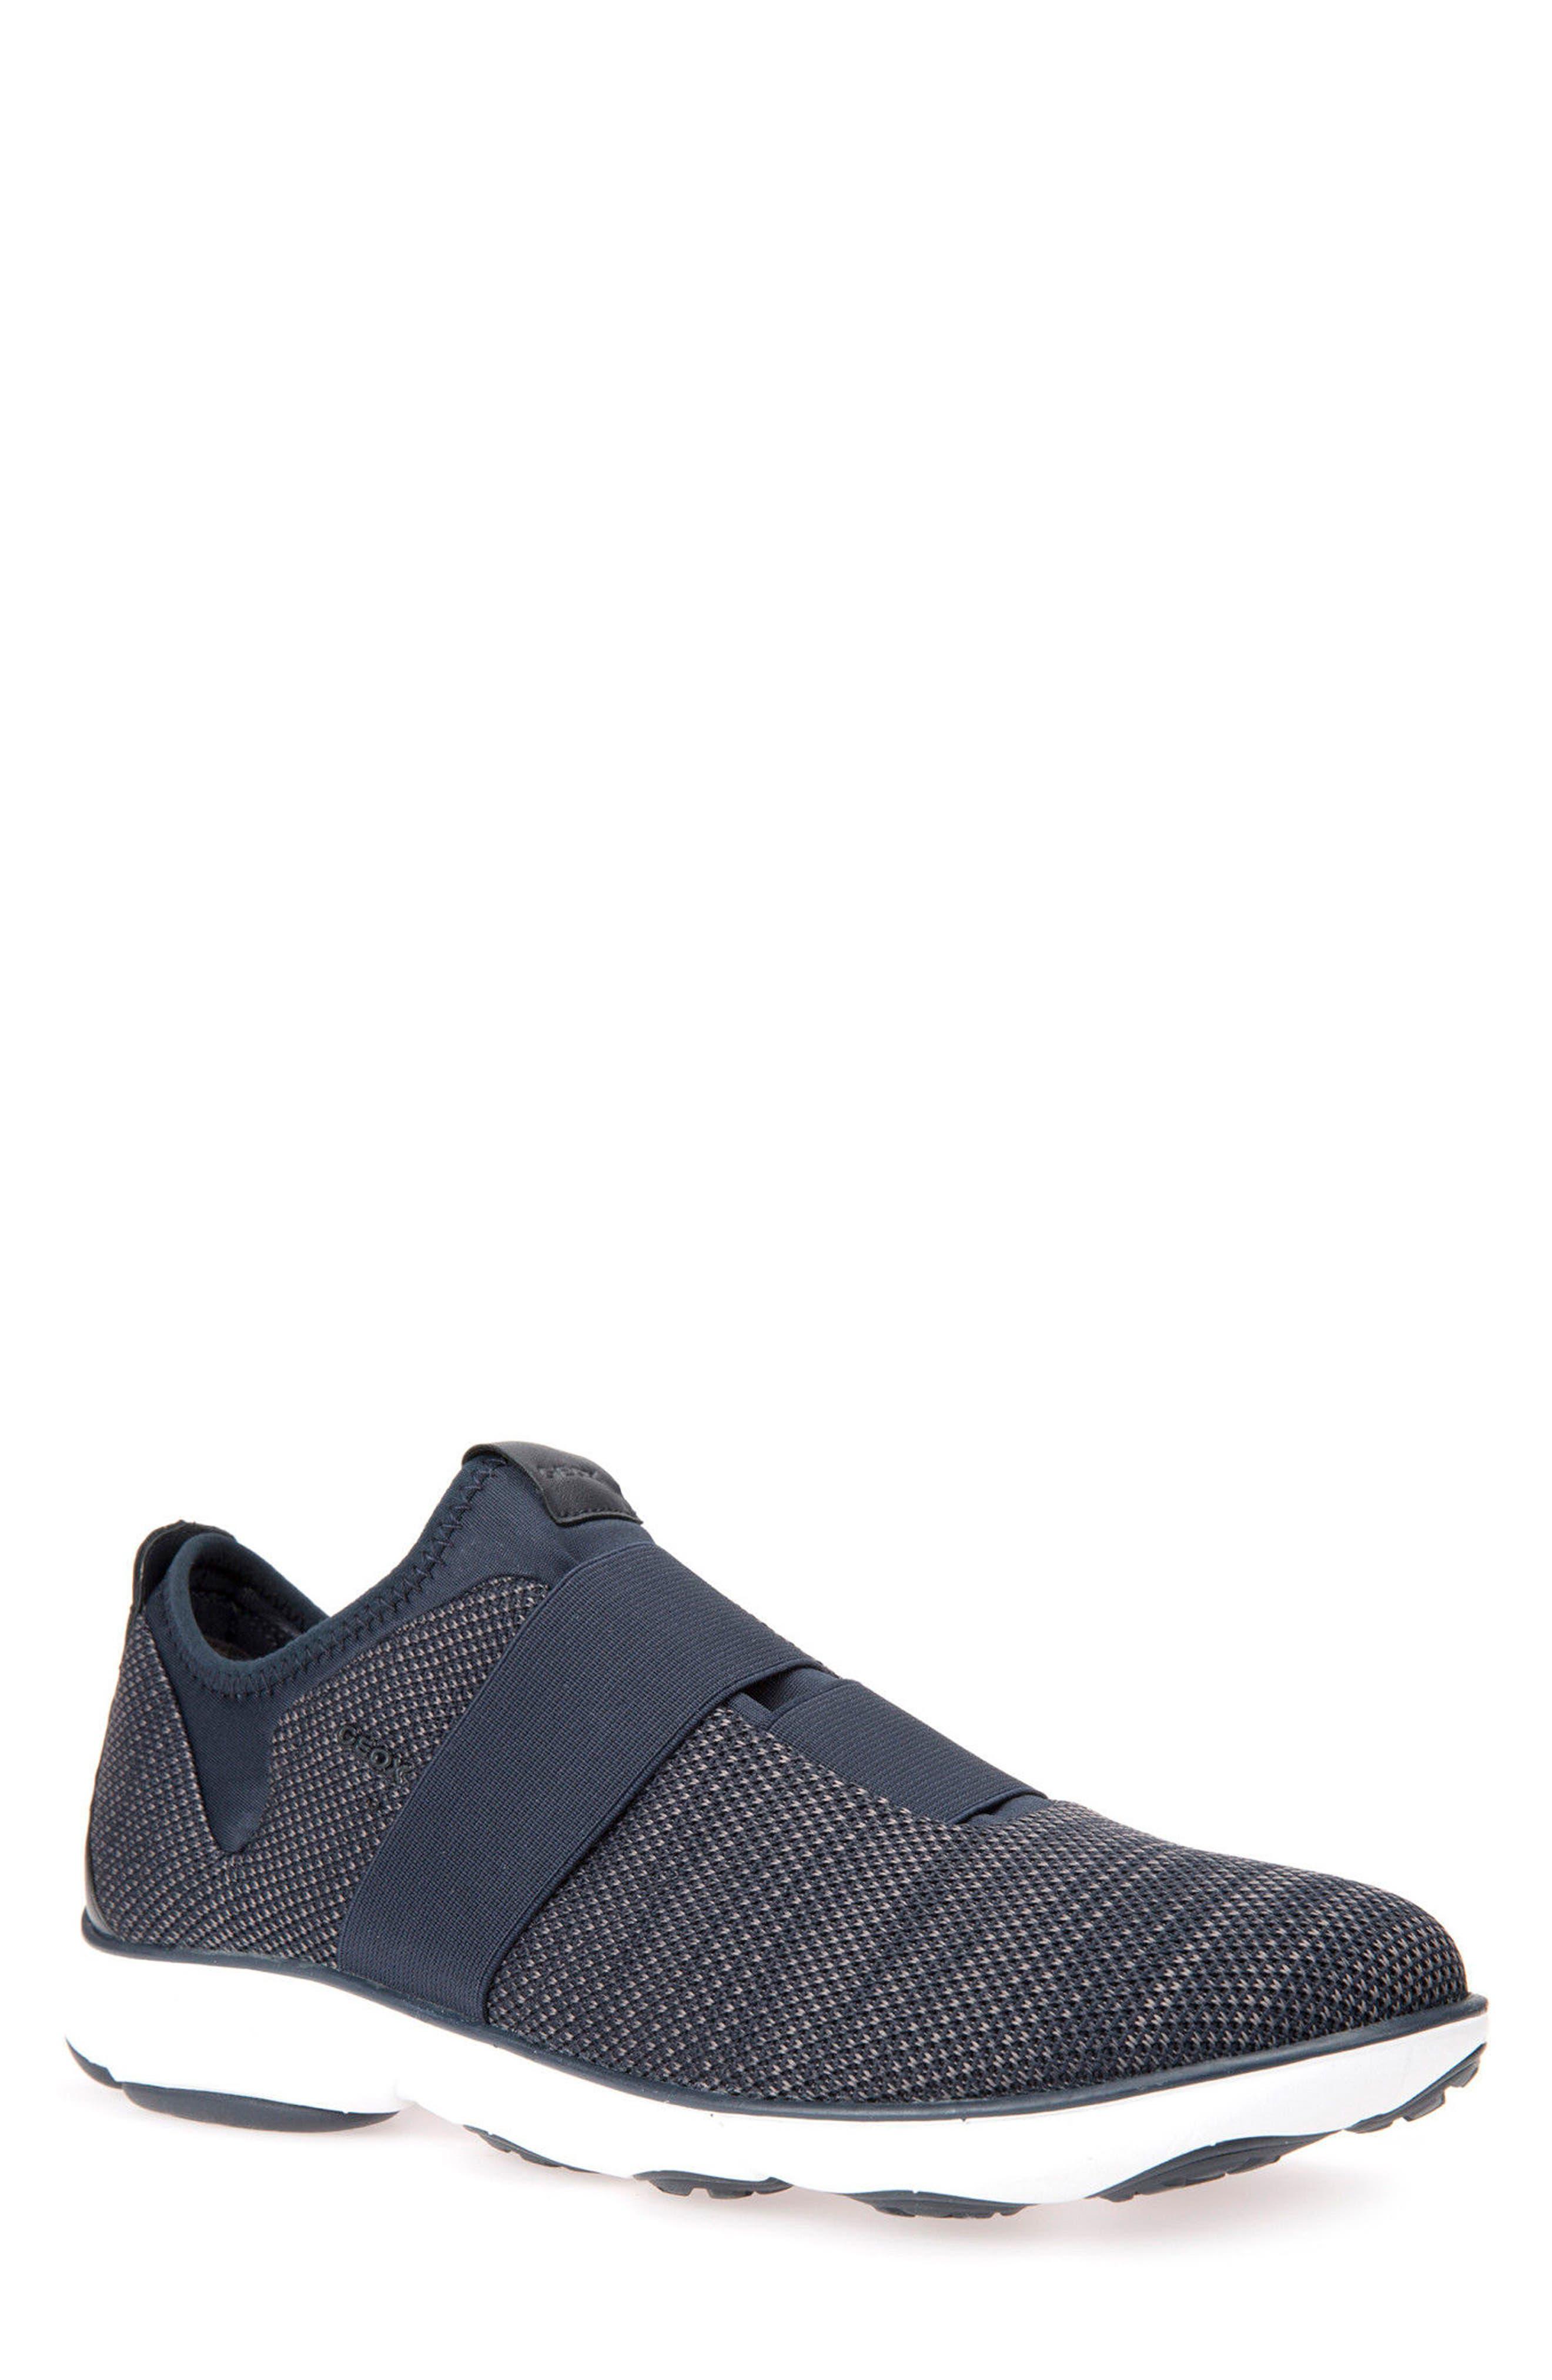 Geox Men's Nebula 45 Banded Slip-On Sneaker